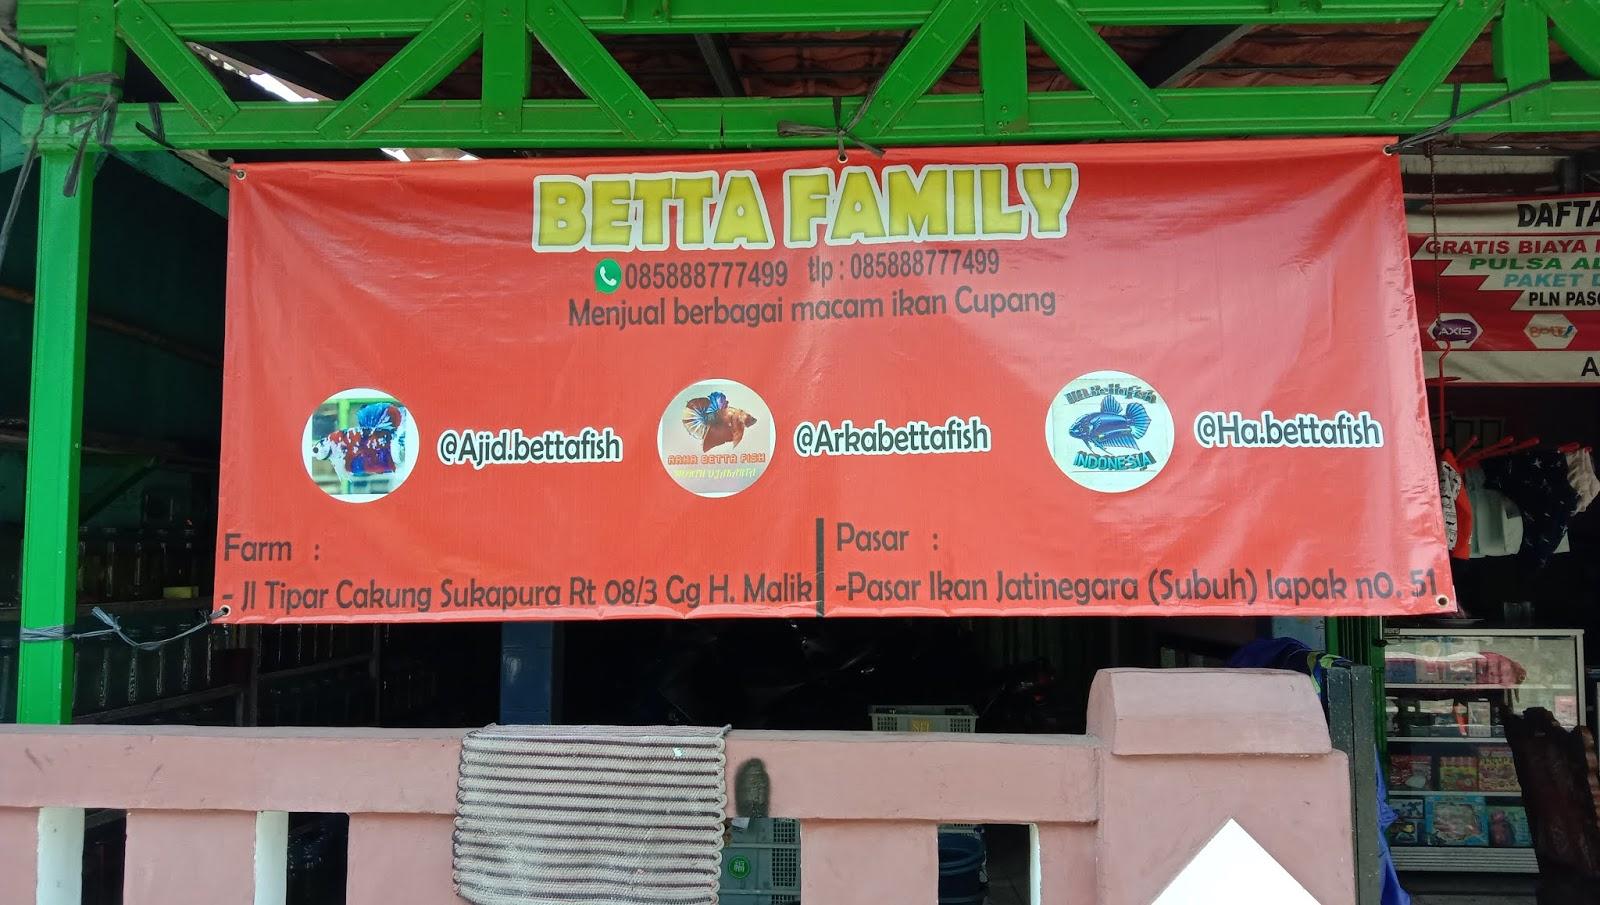 Betta Family